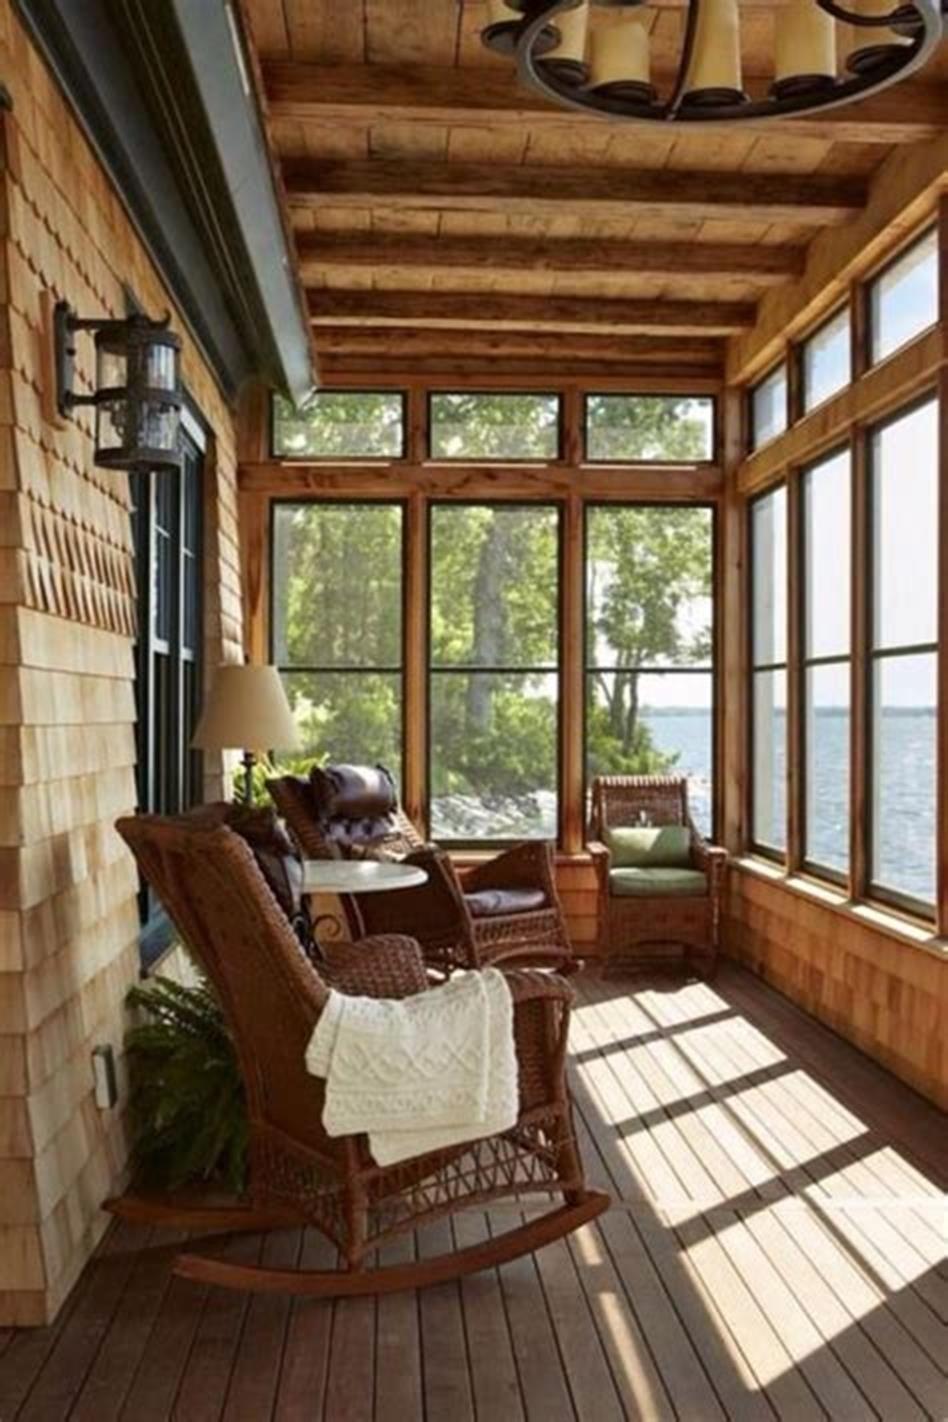 40 Best Screened Porch Design And Decorating Ideas On Budget Decorewarding Rustic Porch Log Cabin Decor Lakehouse Decor